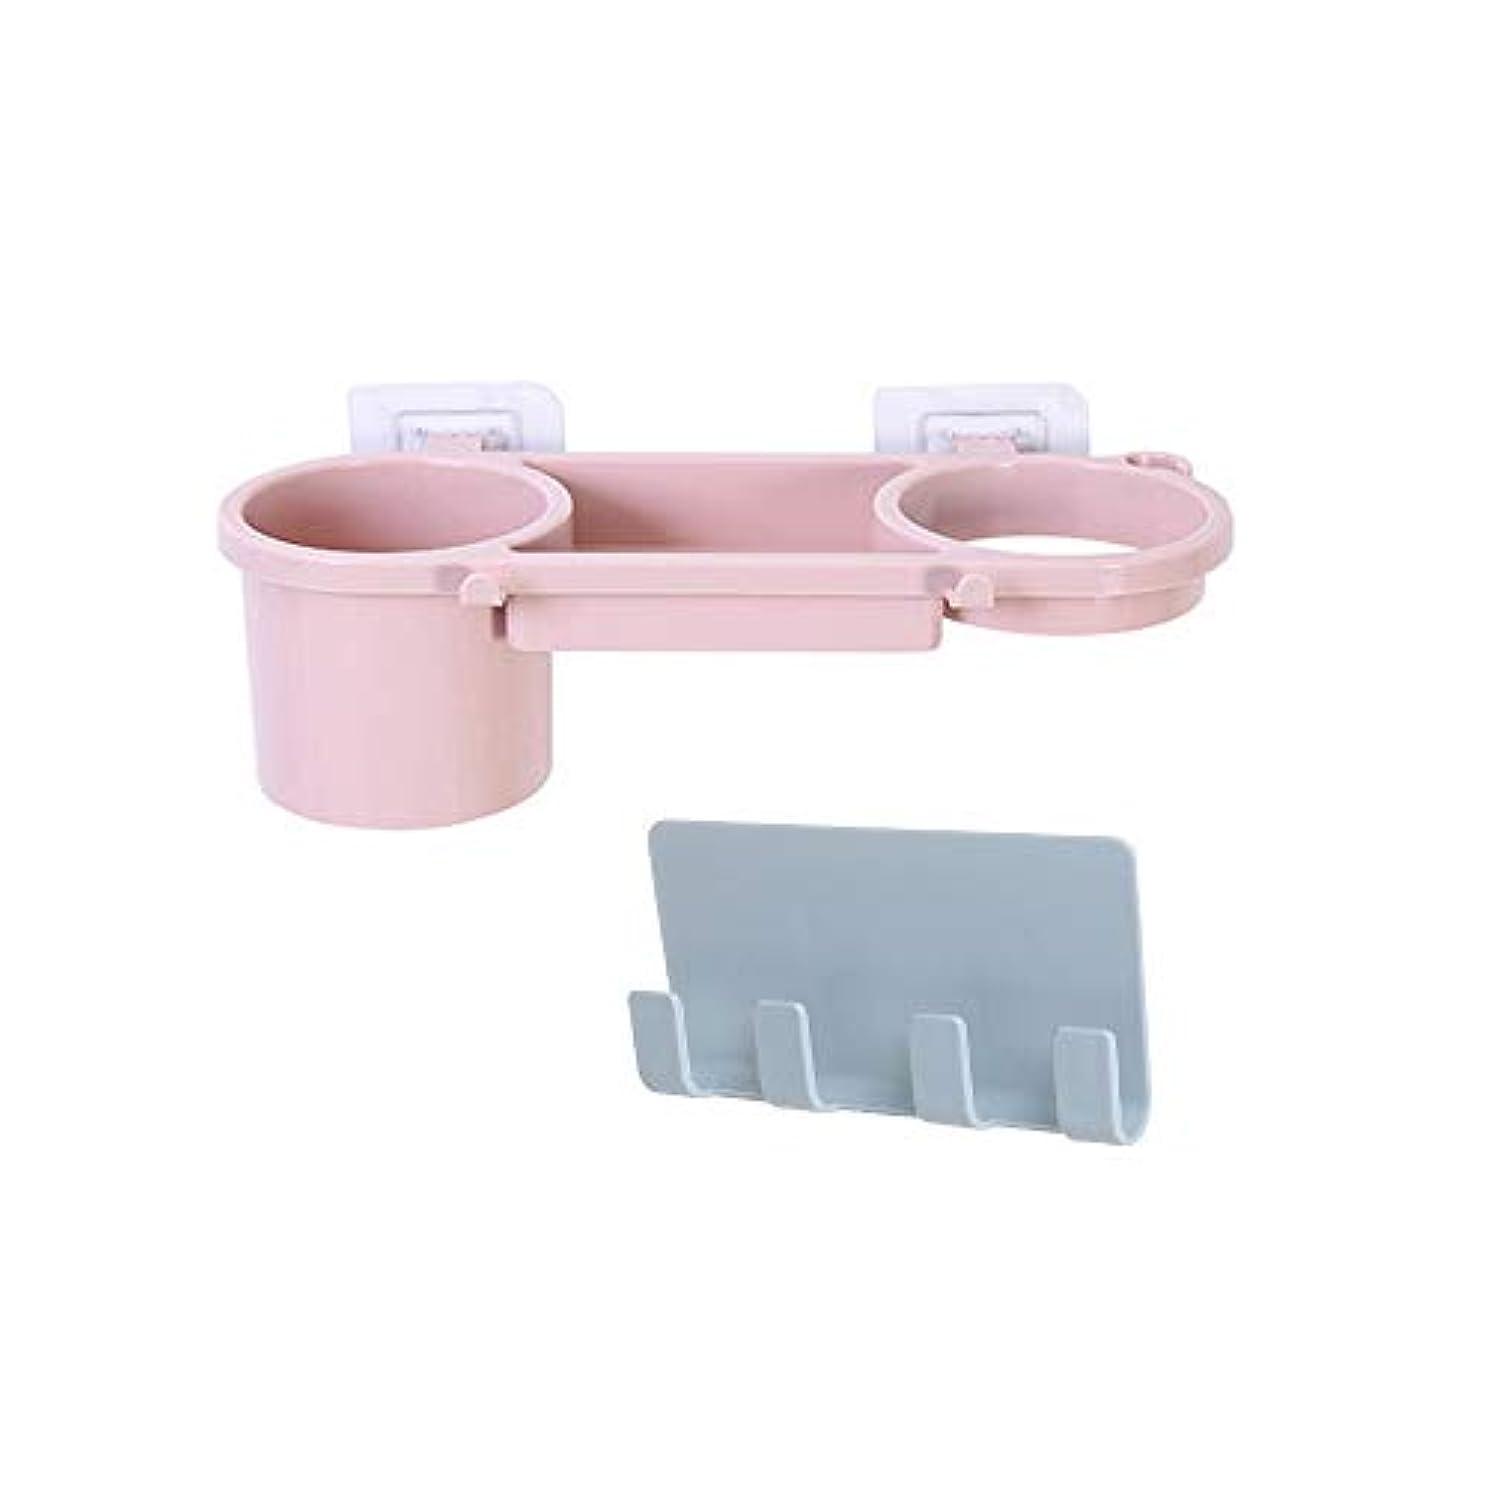 COOSIC Set of 2 Adhesive Bathroom Shelf Storage Organizer Easy to Wall Mount Storage Basket for Hair Dryer, iPhone, Plug